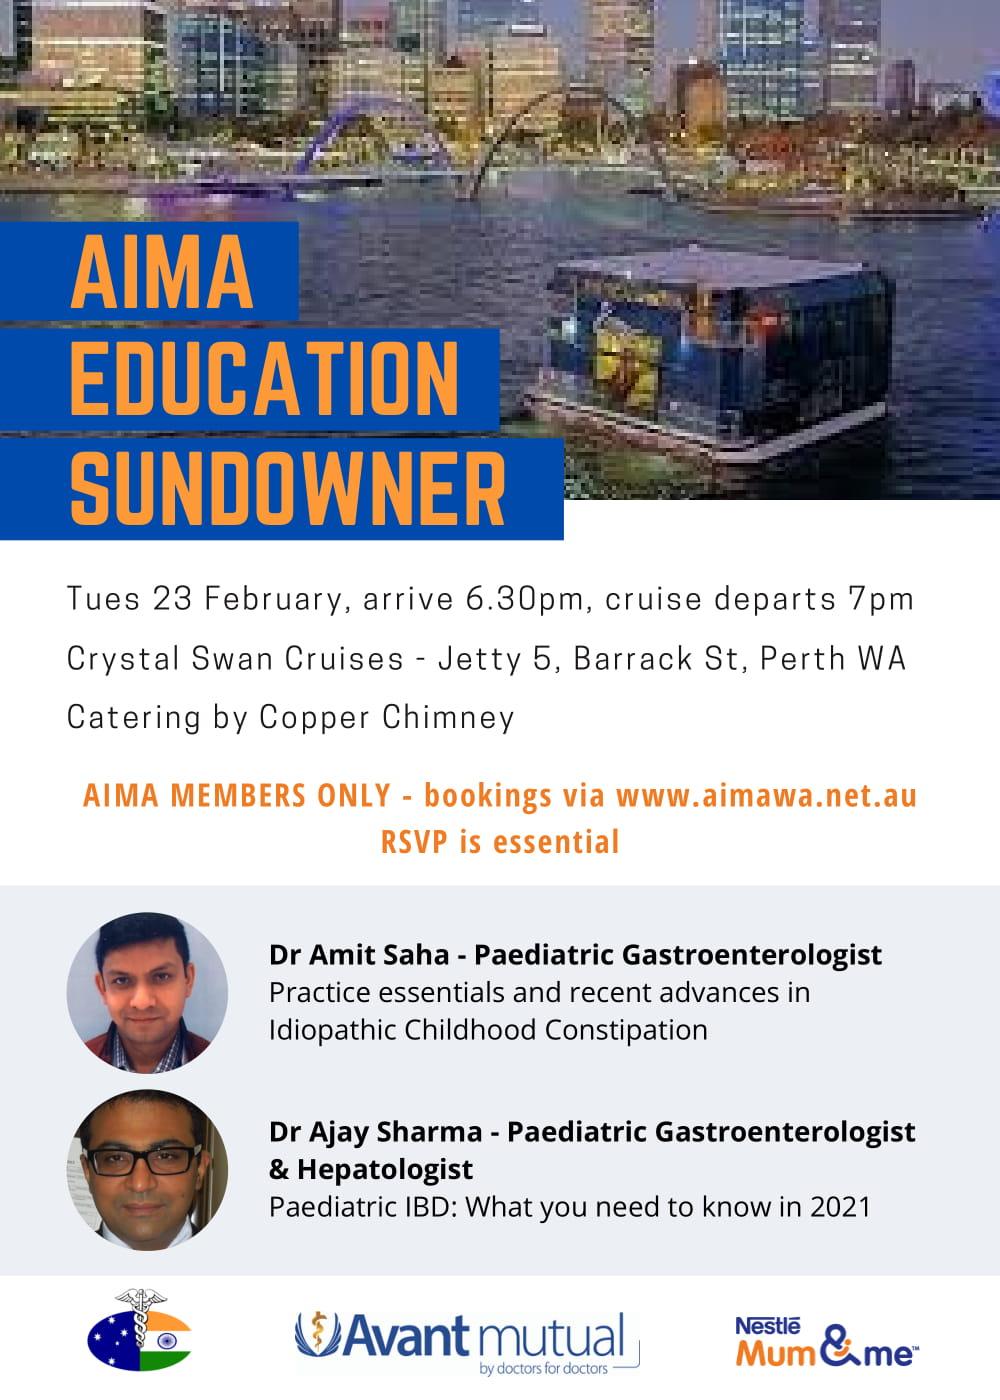 AIMA EDUCATION SUNDOWNER